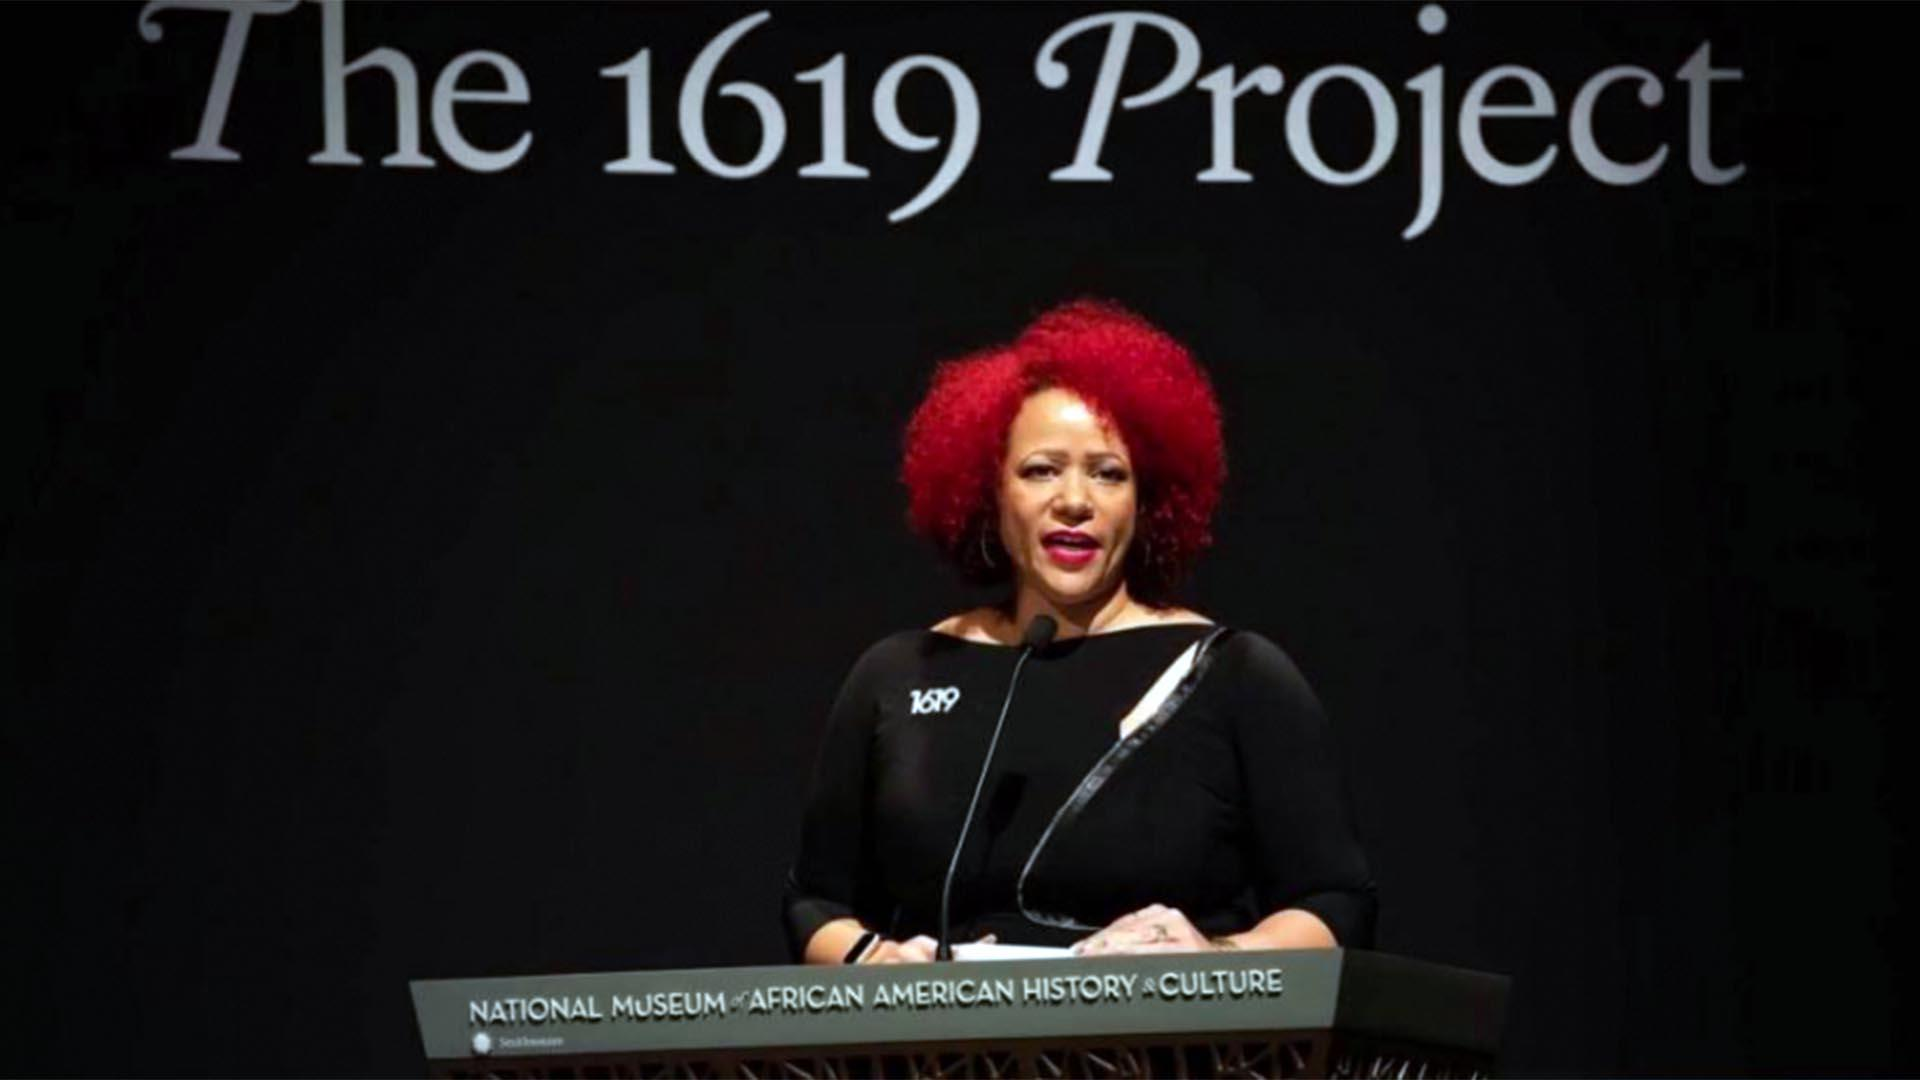 Historians, artists, athletes, activists: Nikole Hannah-Jones controversy  at UNC part of 'rising tide of suppression' :: WRAL.com